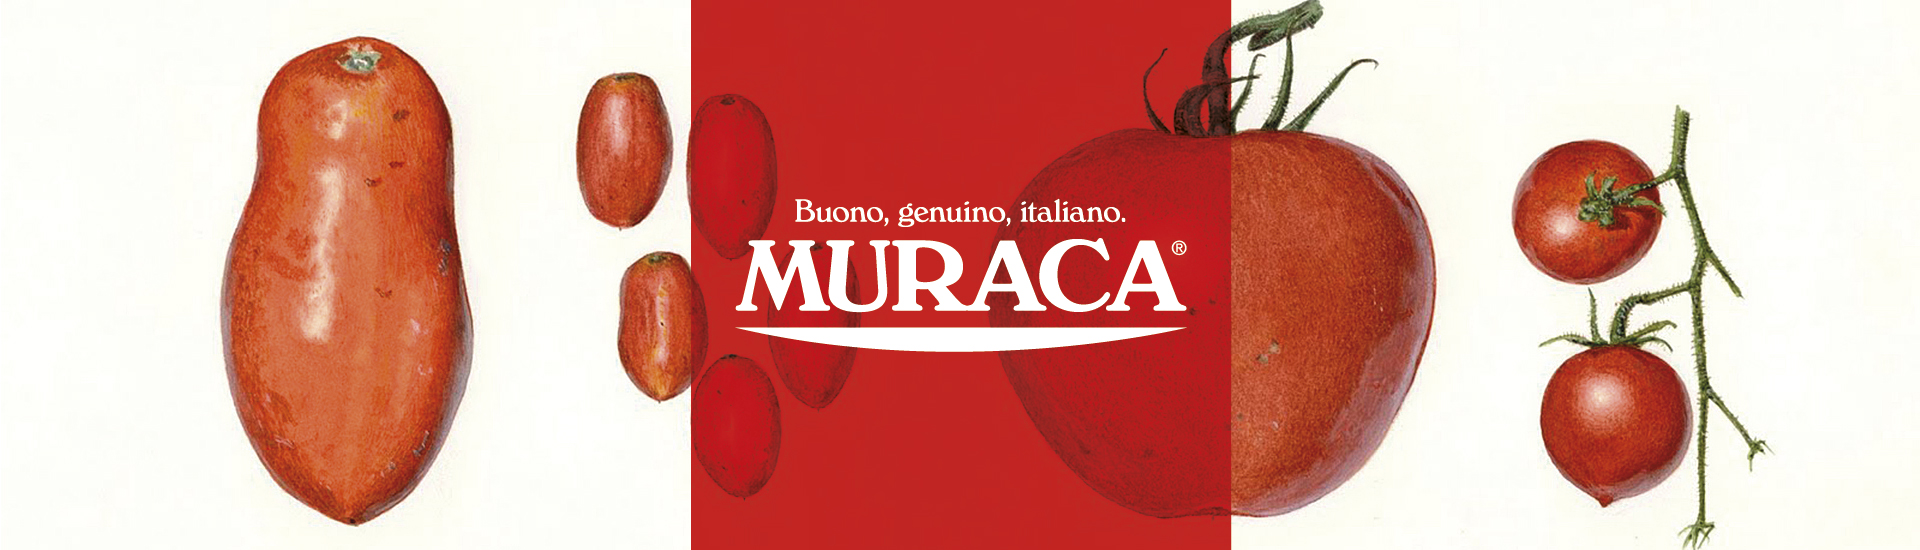 logotipo Muraca